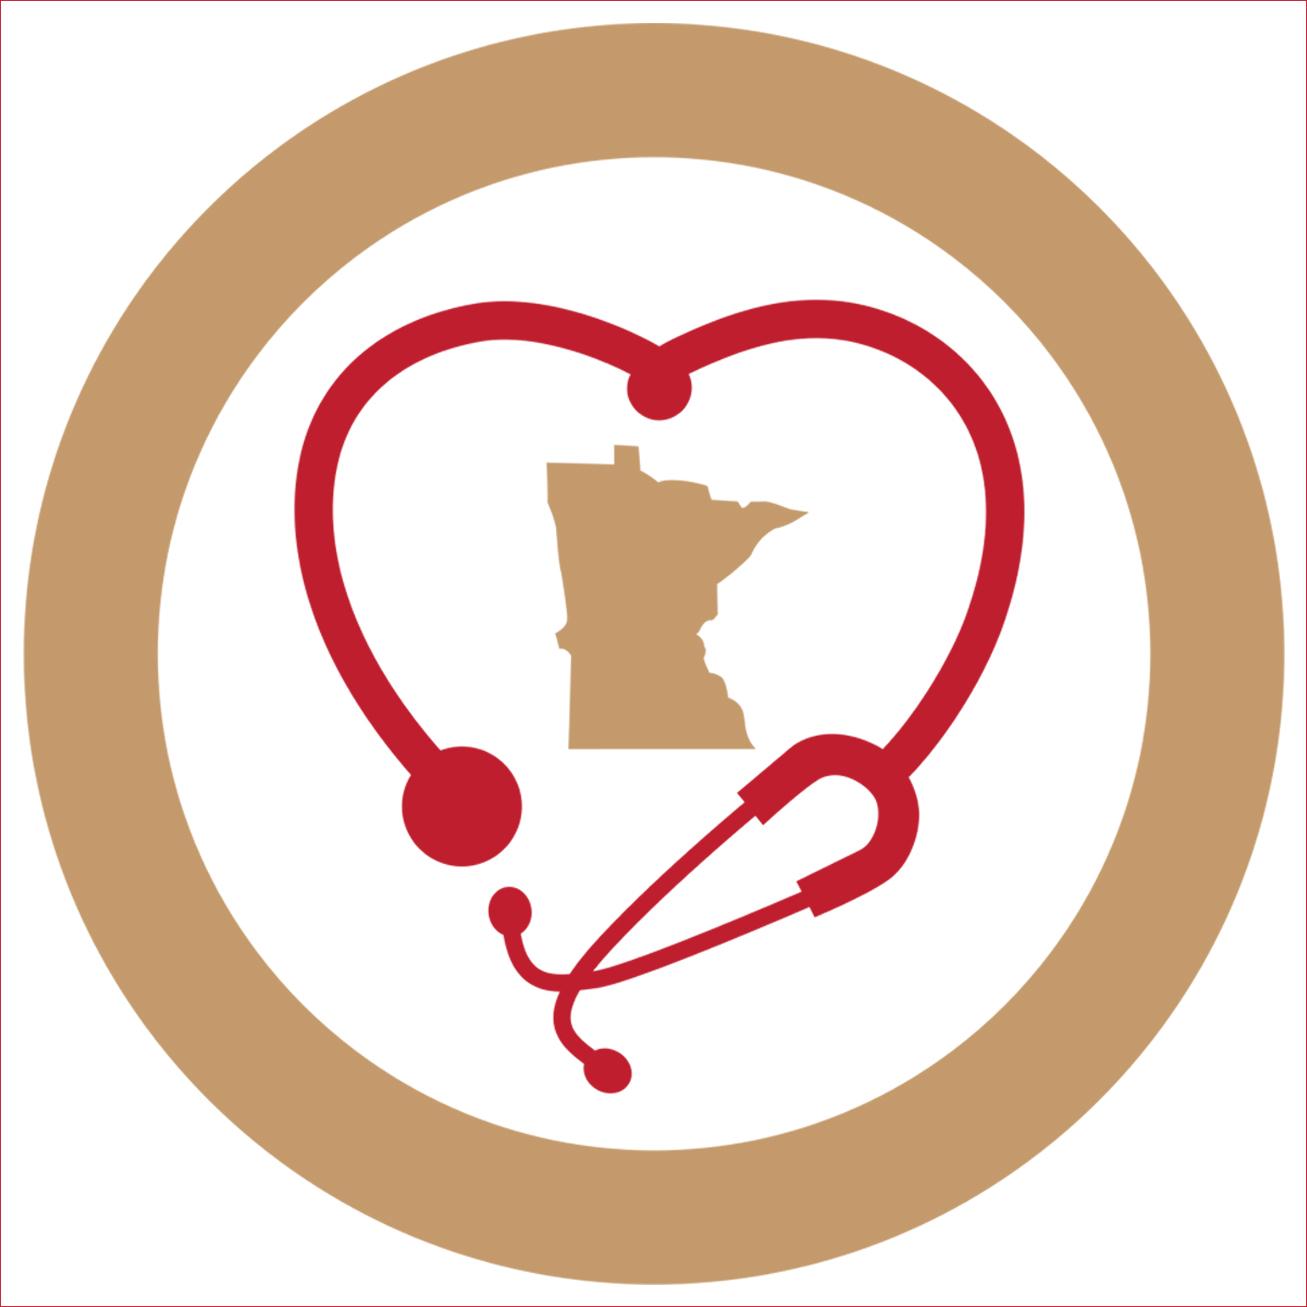 Minnesota Senate Republicans - Health Care Emergency Aid and Access